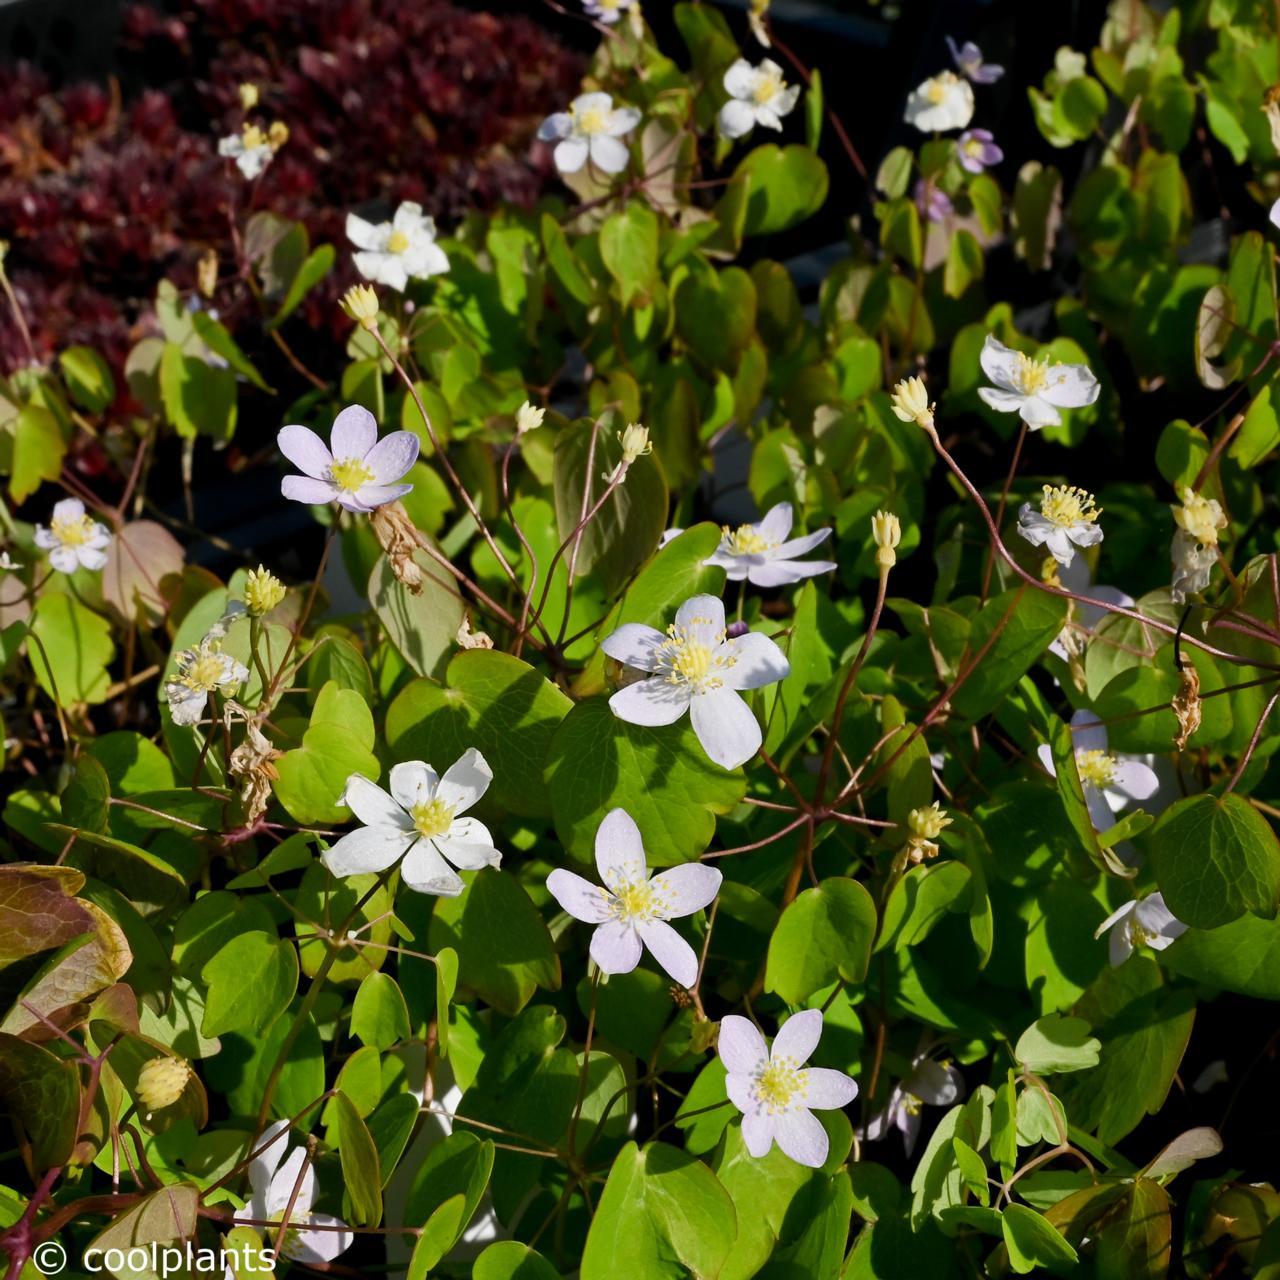 Anemonella thalictroides f. rosea plant